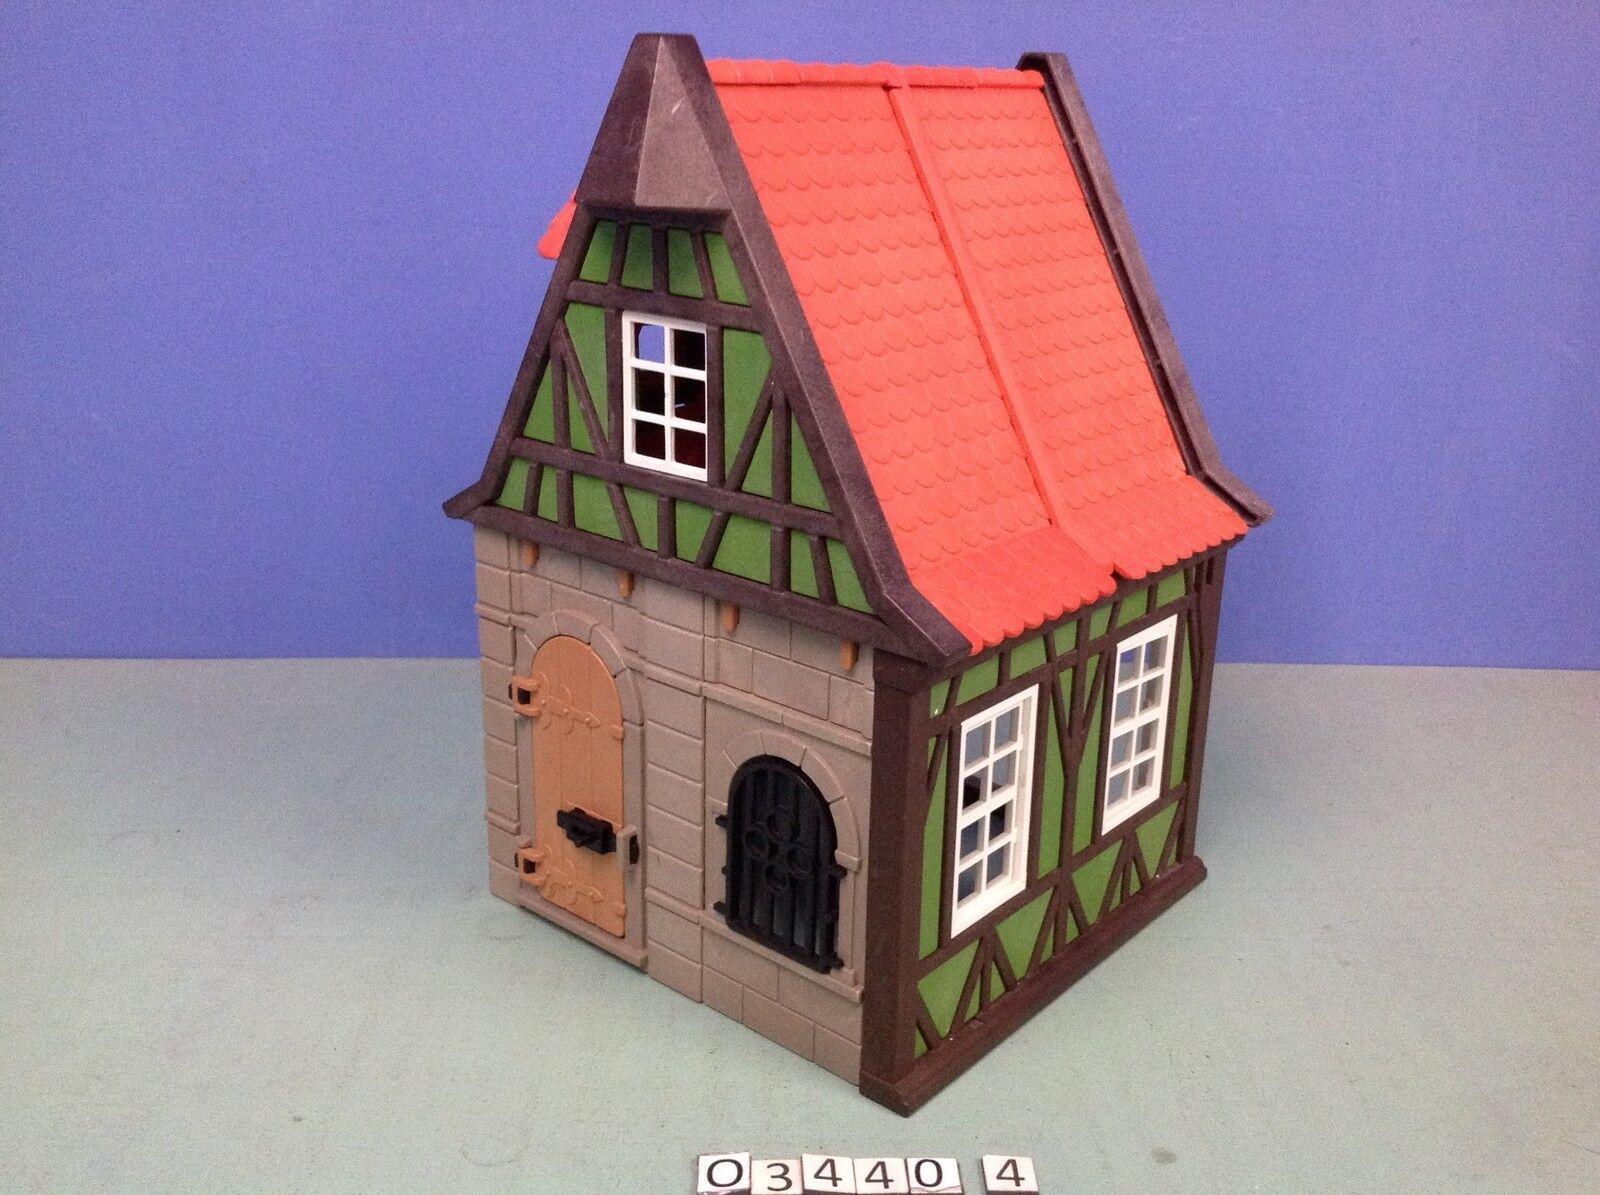 (O3440.4) playmobil maison médiévale Grüne le Größeur ref 3440 3666